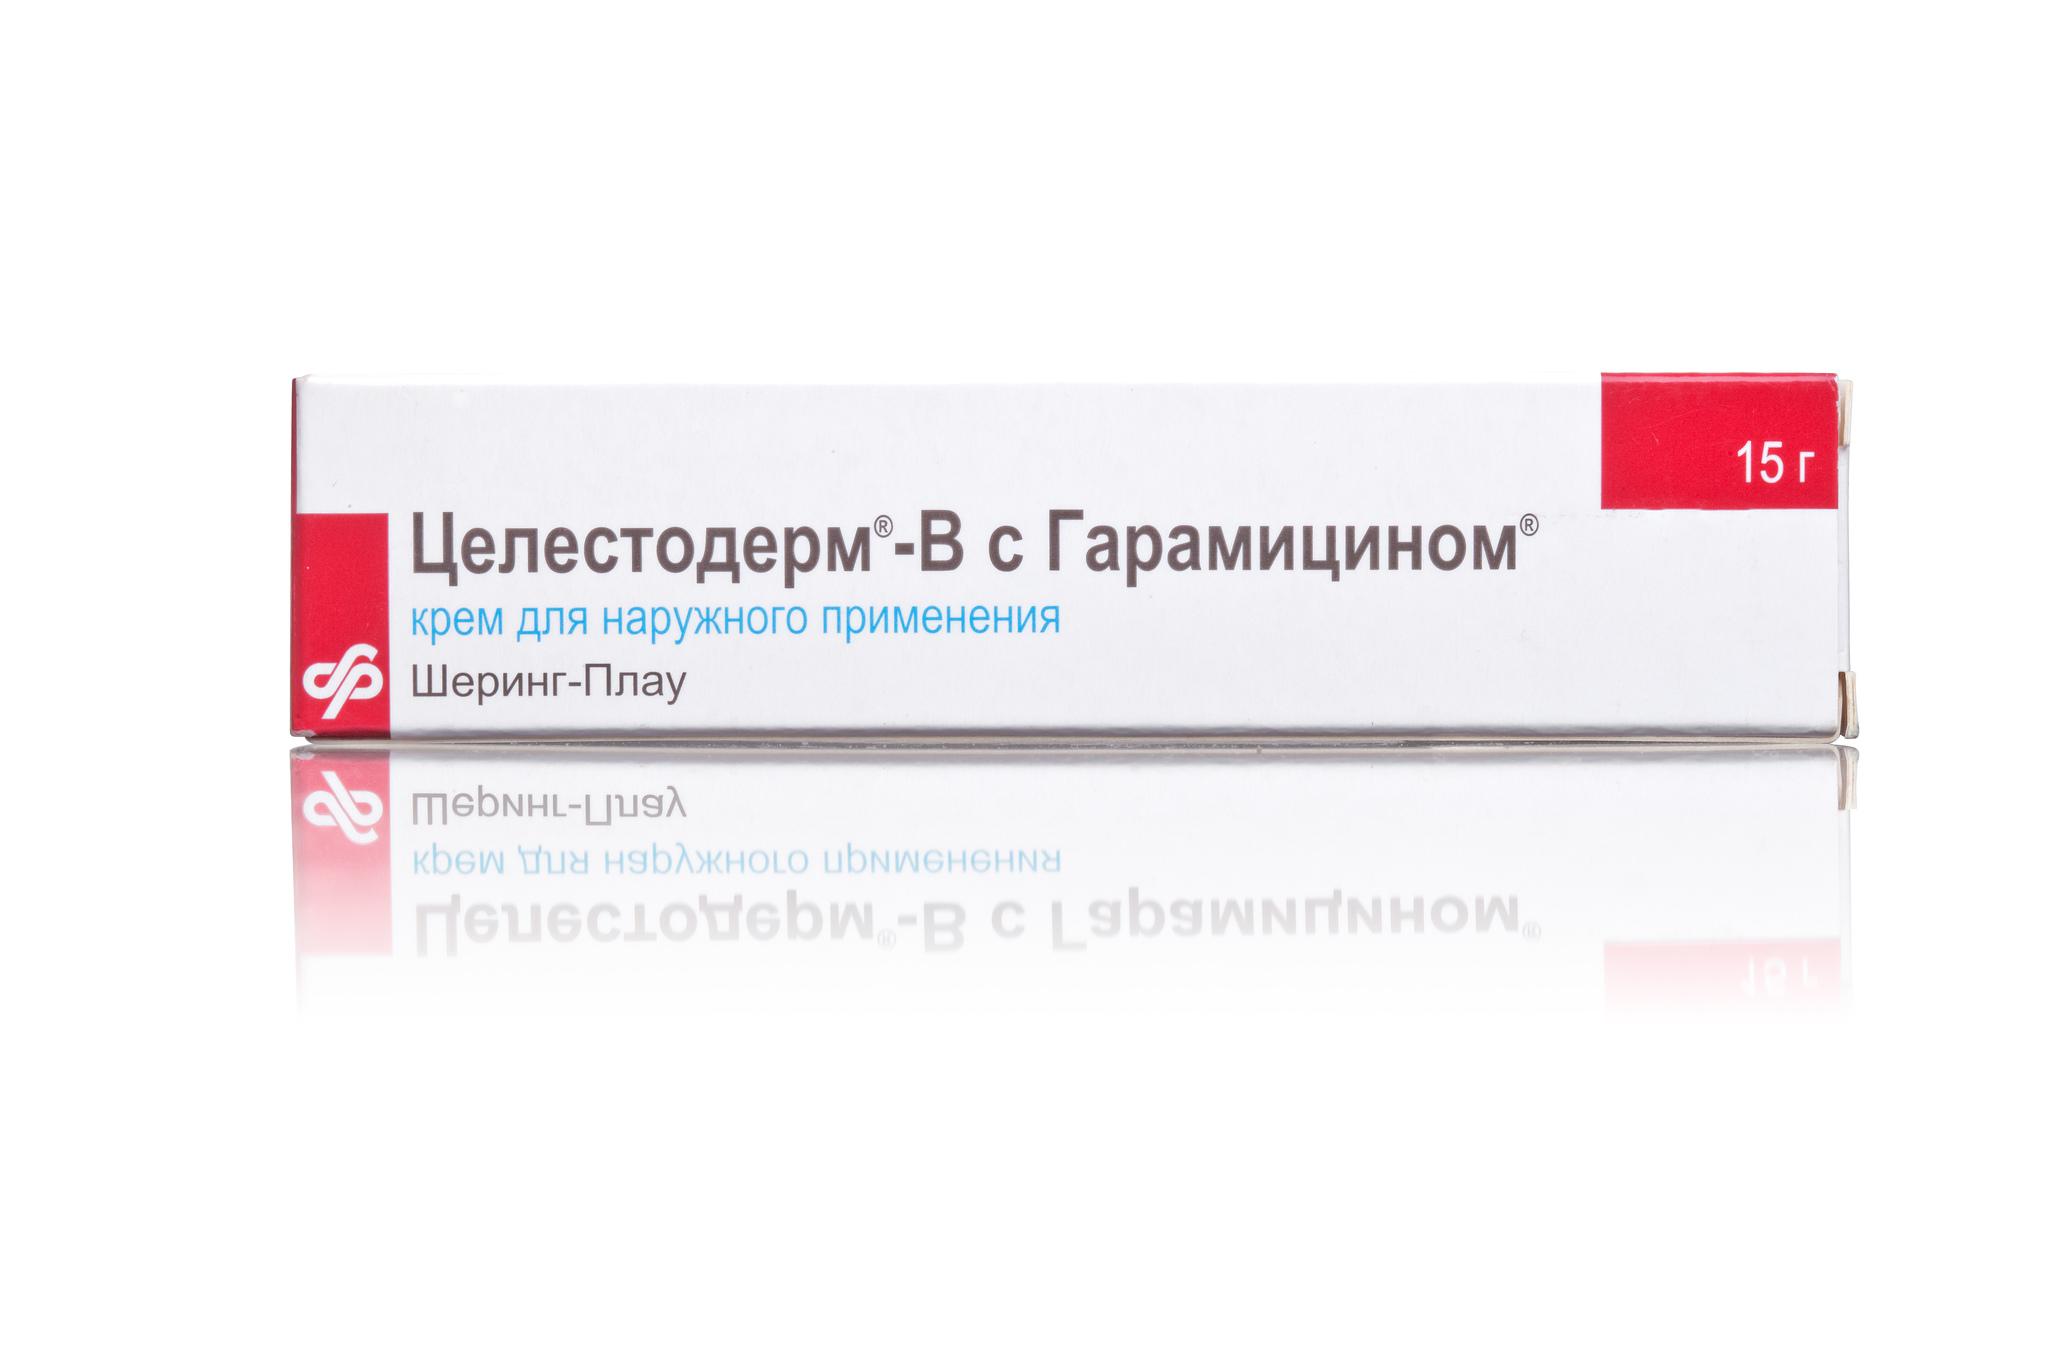 Целестодерм-B с Гарамицином крем 15 г.